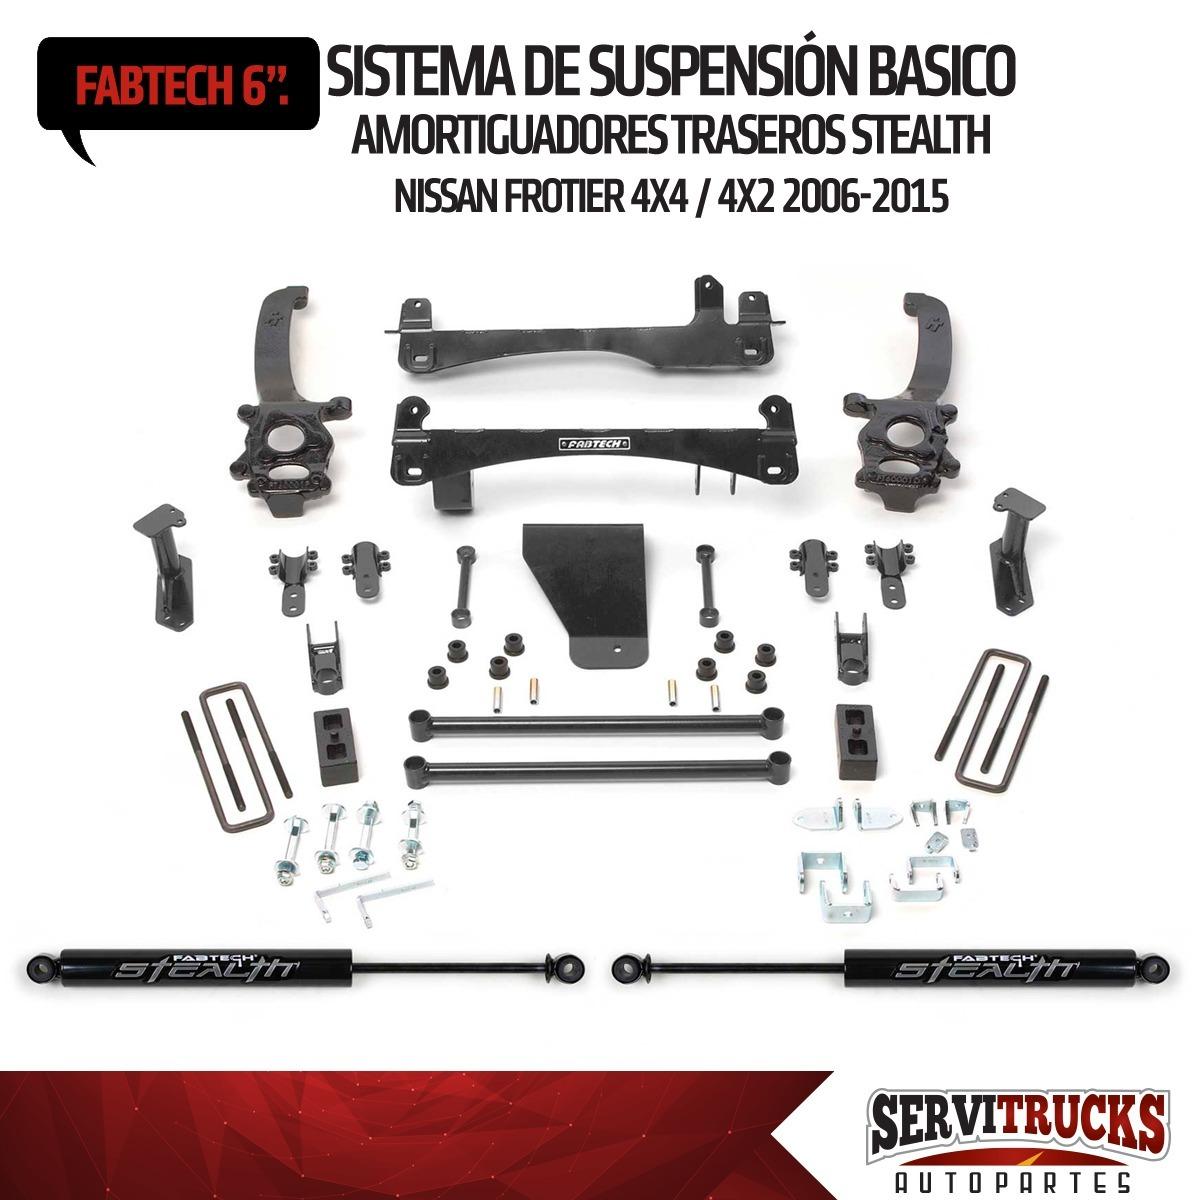 Kit De Suspension 6p Amor Tras Stealth Nissan Frontier 06-15 - Bs ...